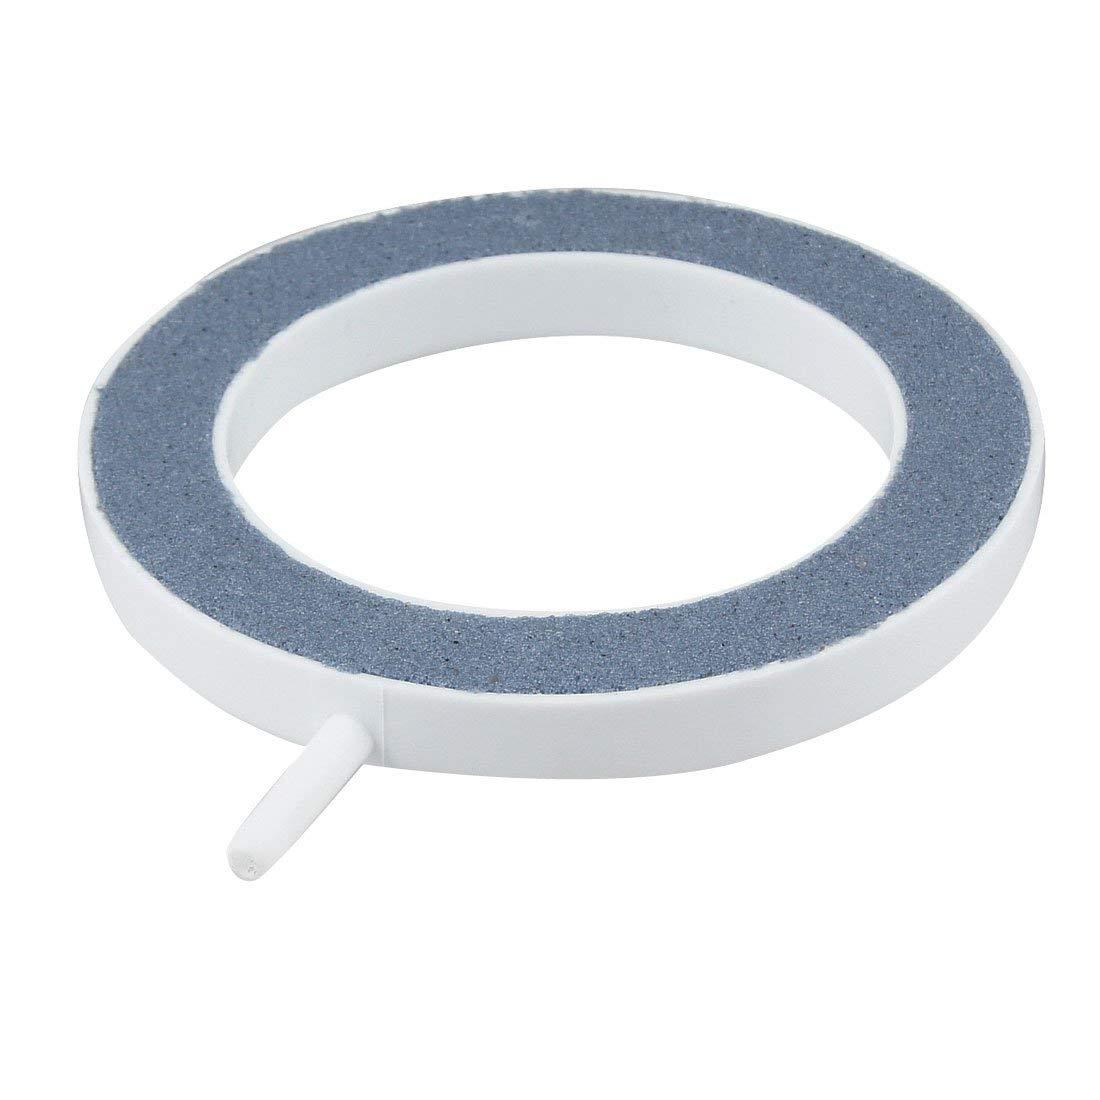 Uxcell Aquarium Bubbles Airstone, 5mm Hose, Blue/White